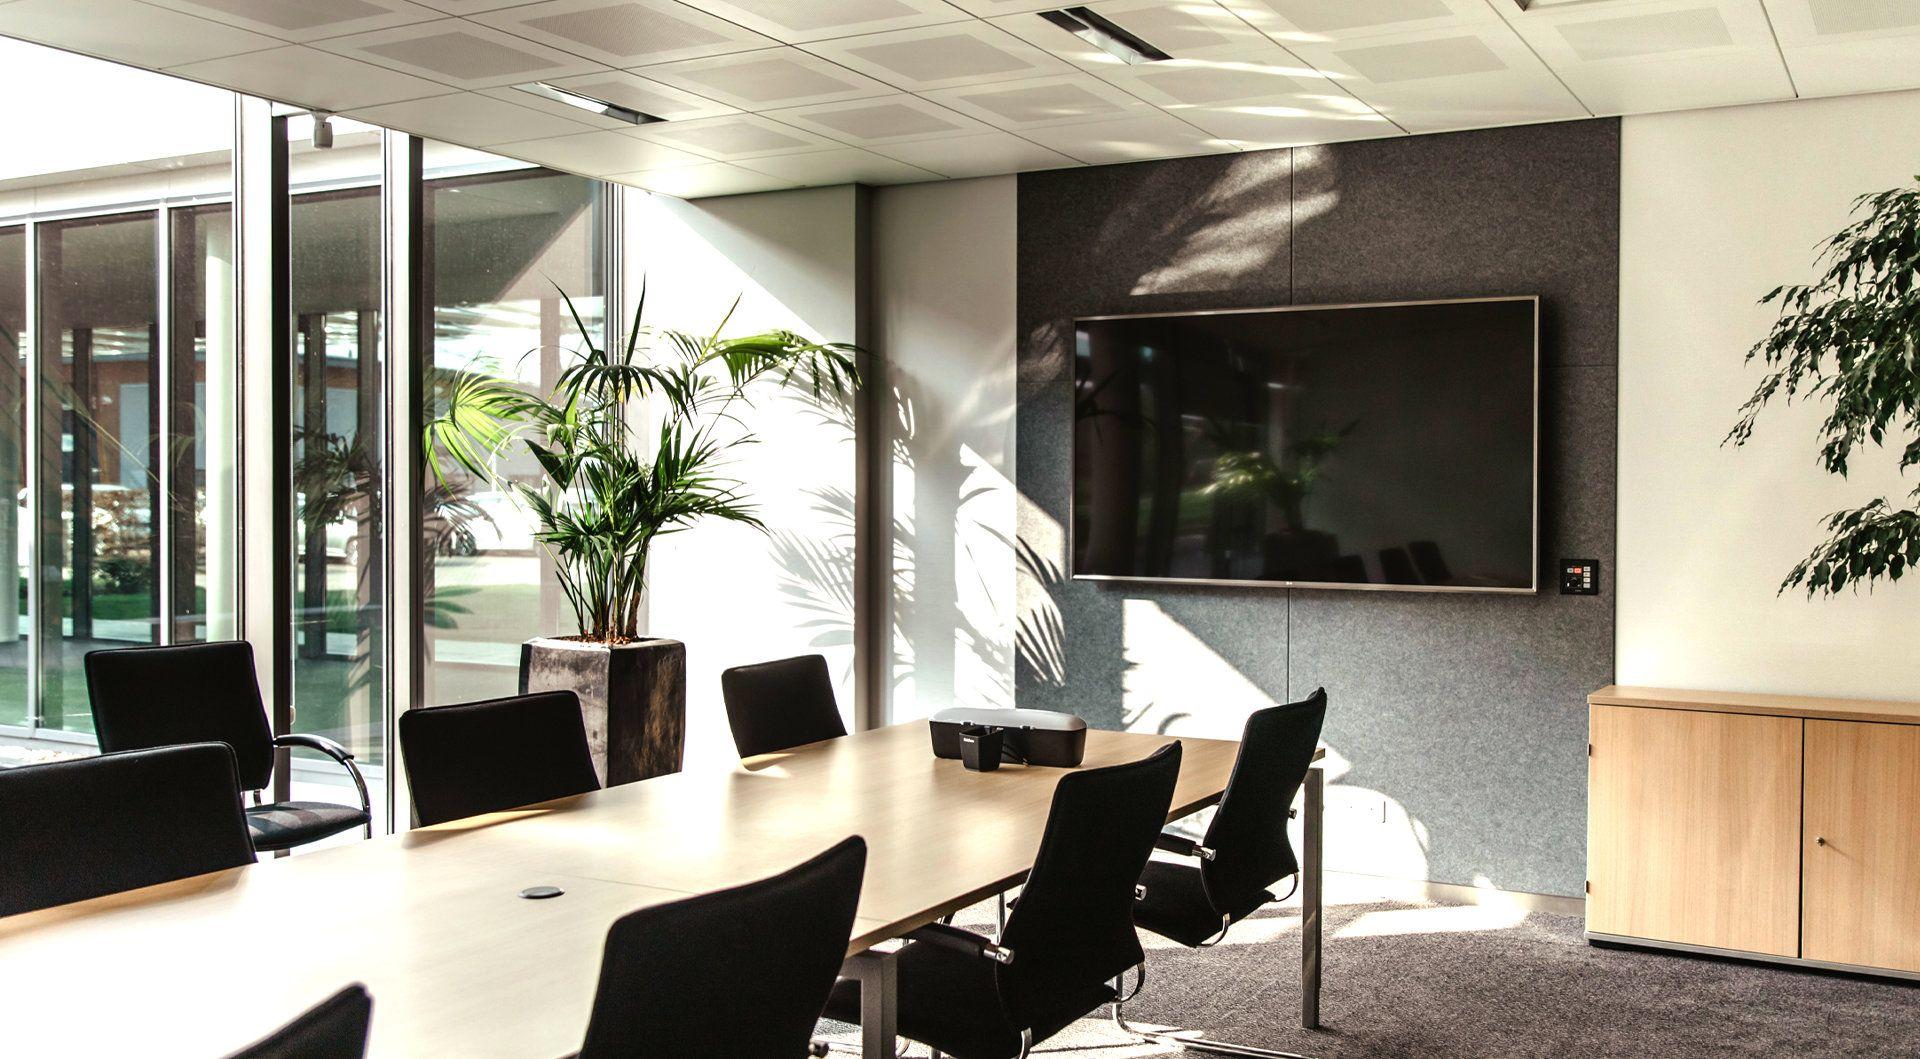 "LG 32SE3KE beeldkrant 81,3 cm (32"") LED Full HD Digitale signage flatscreen Zwart - Case studie de vries"